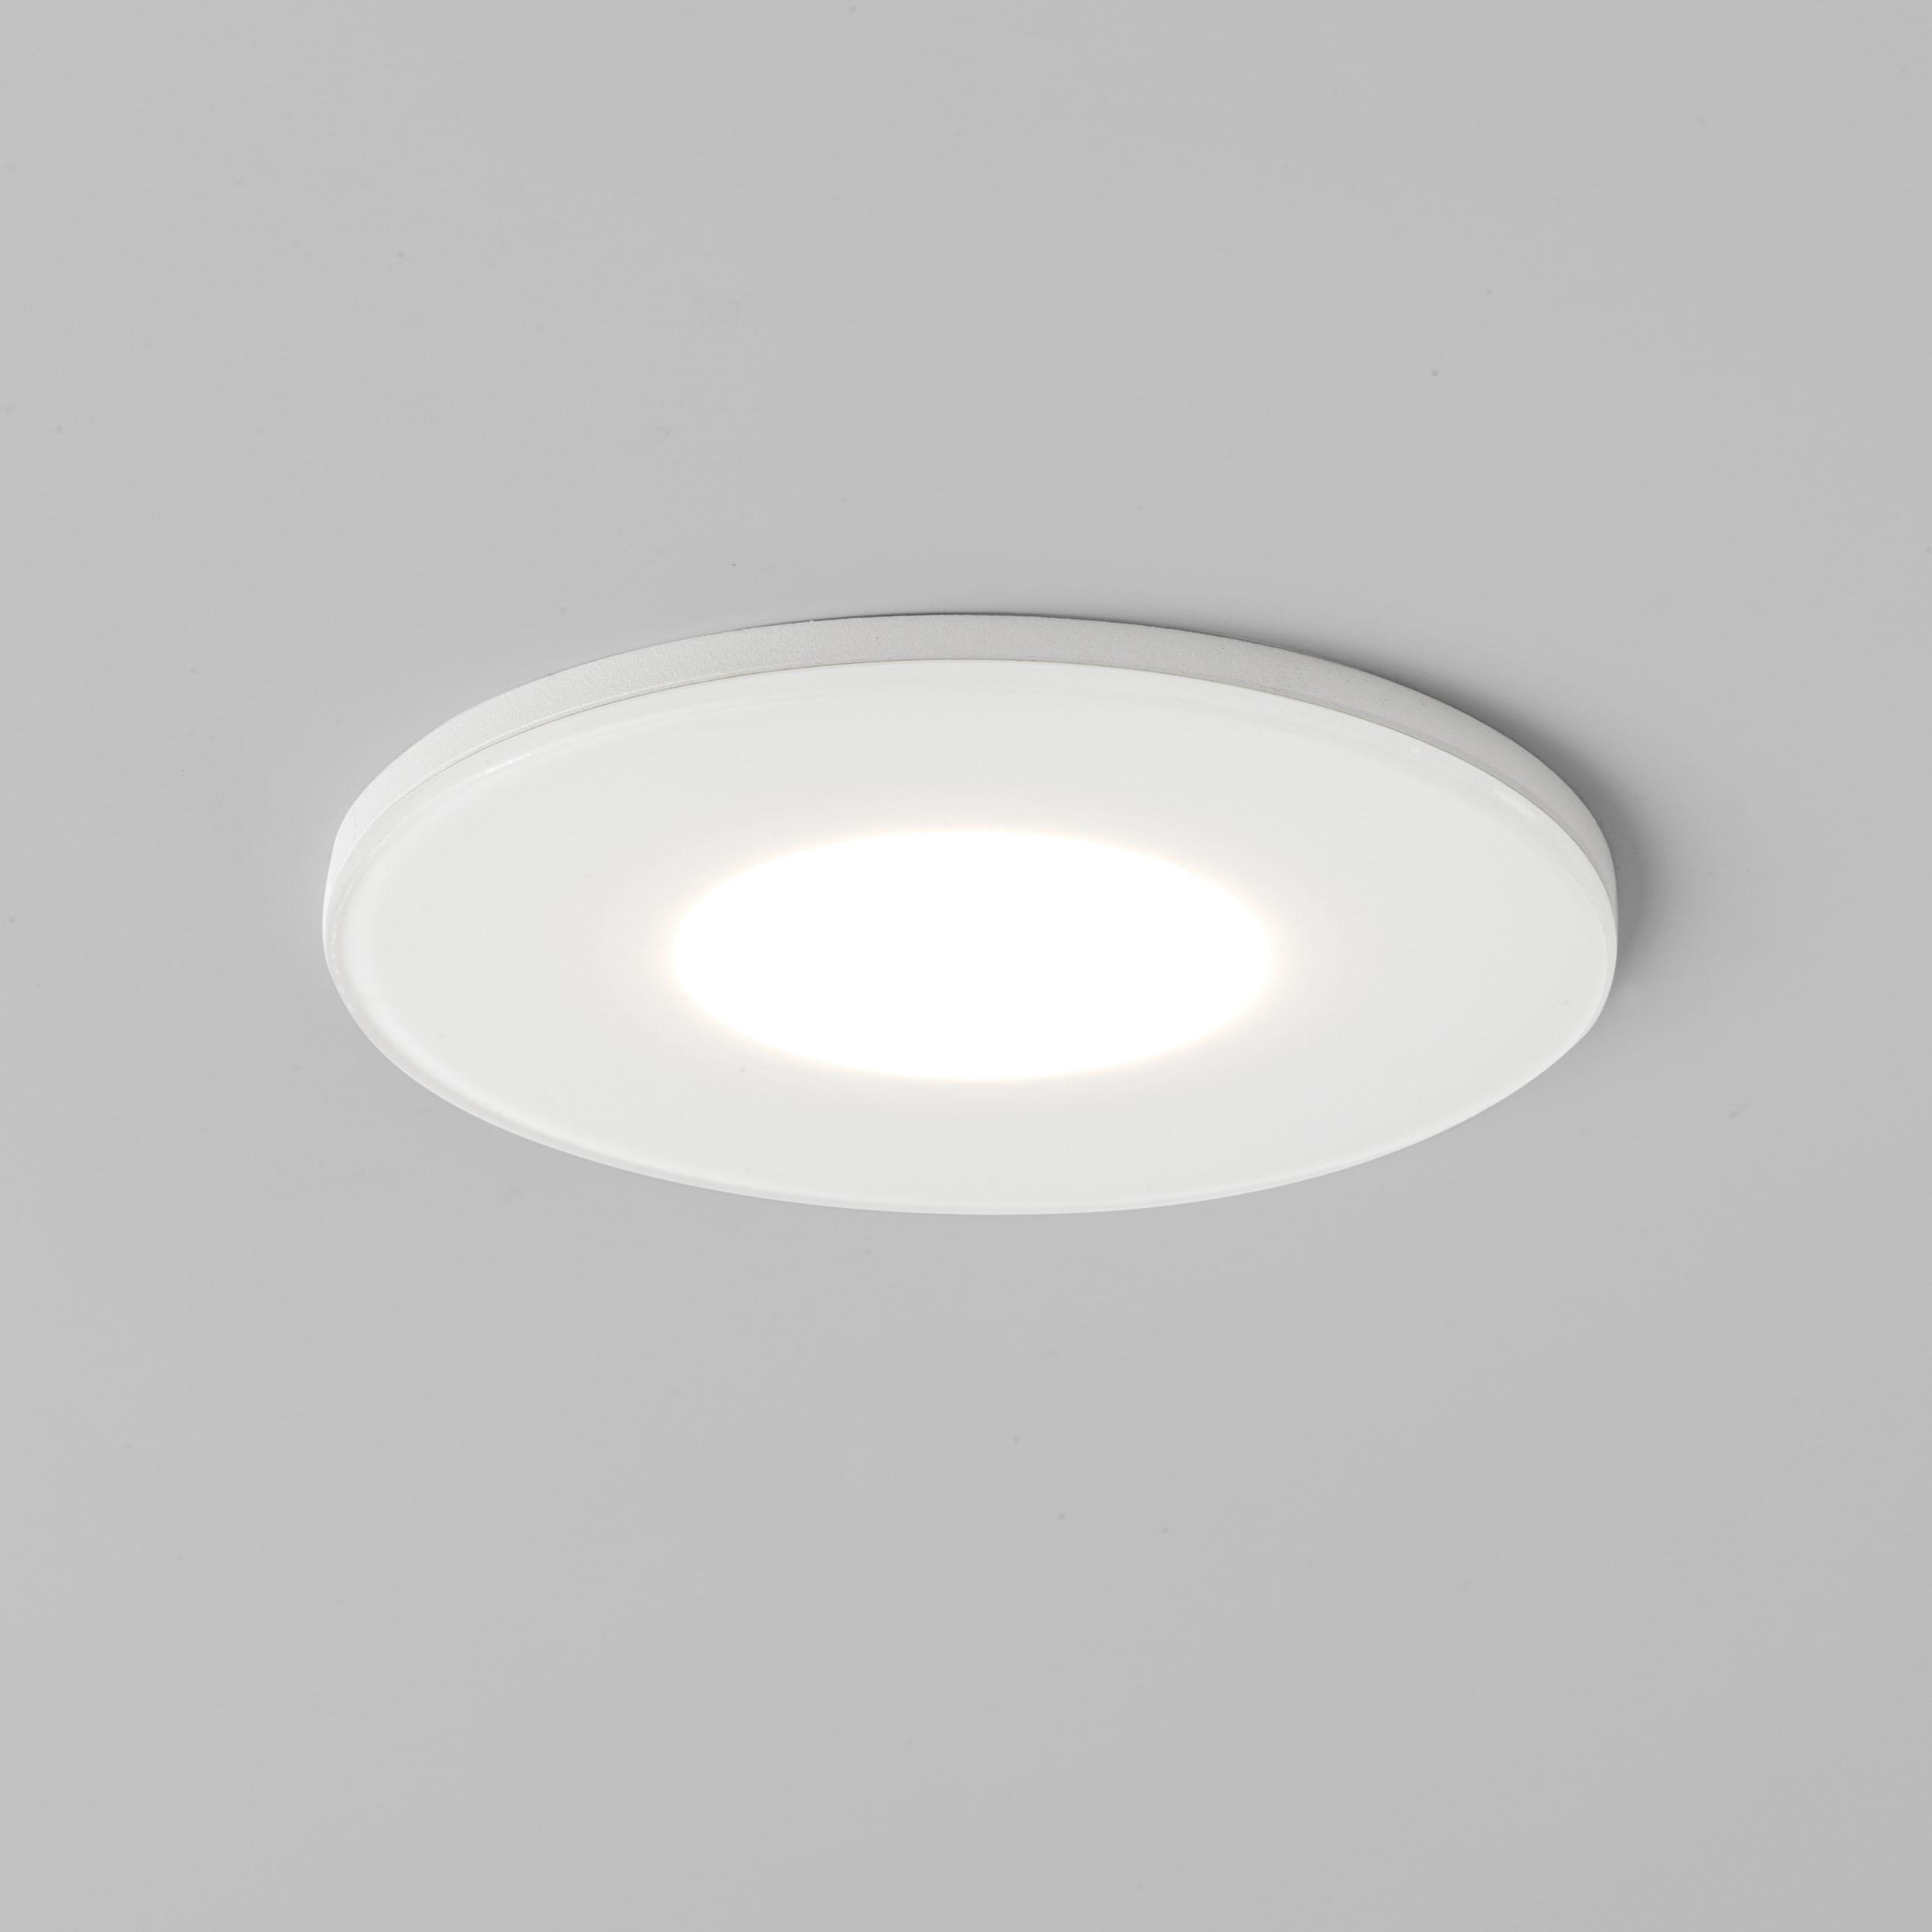 Led bathroom downlights fixed astro mayfair shower ip65 74w white led bathroom downlights fixed astro mayfair shower ip65 74w white 2700k aloadofball Choice Image